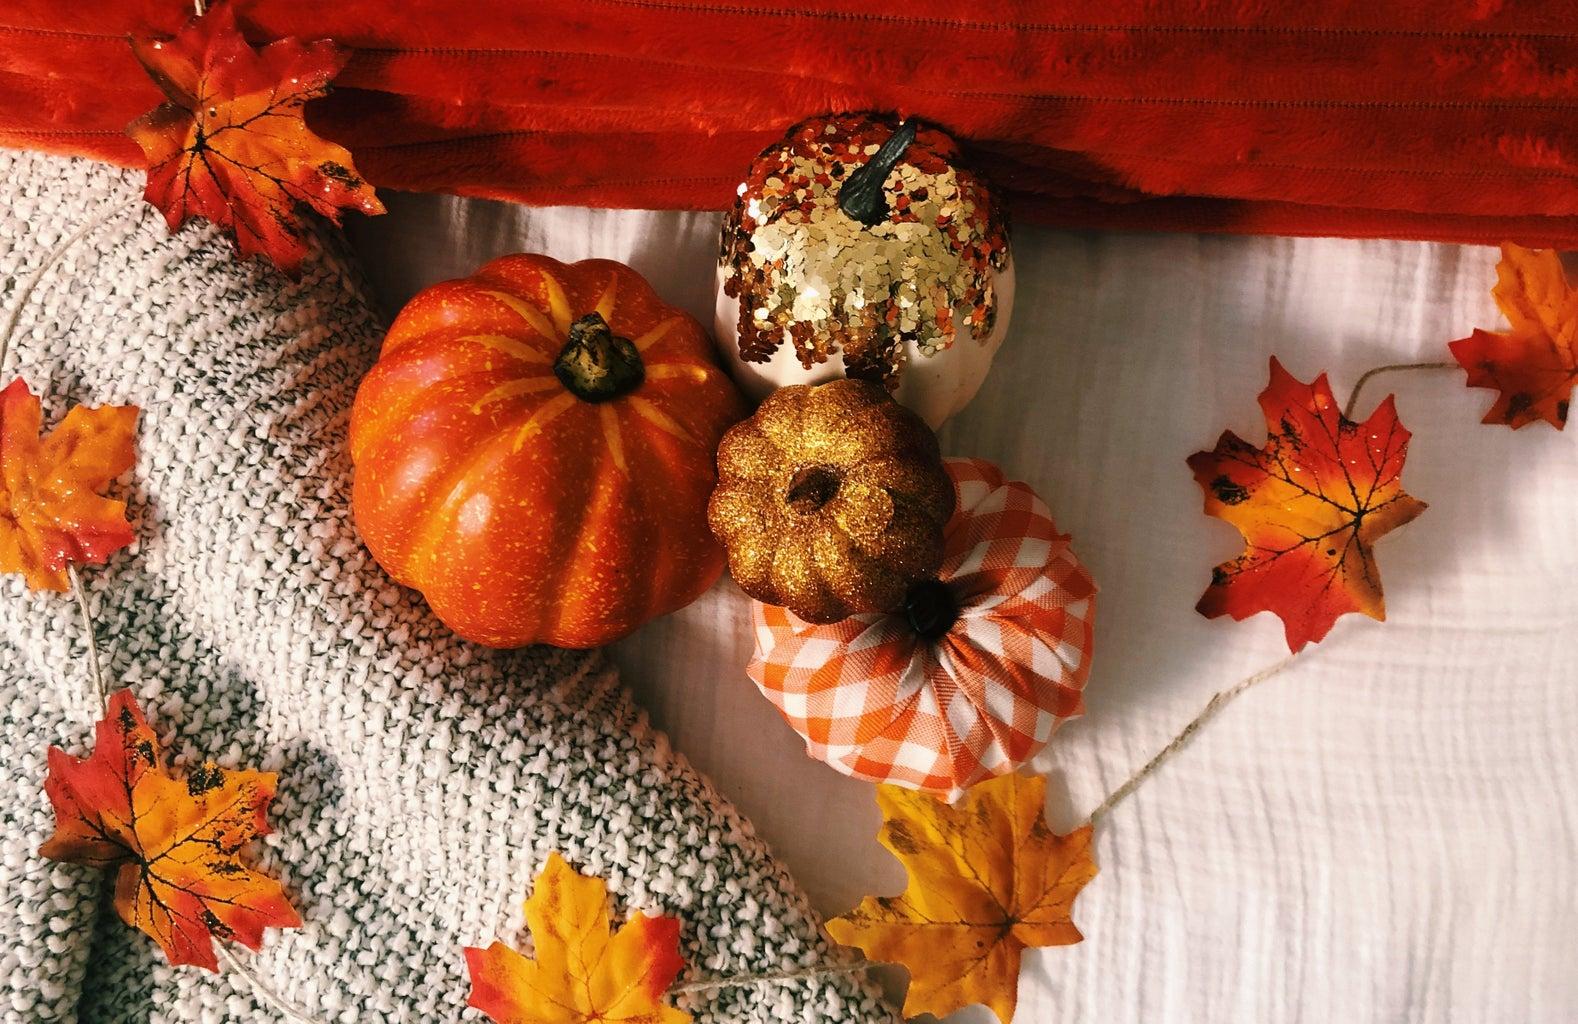 pumpkins on blankets